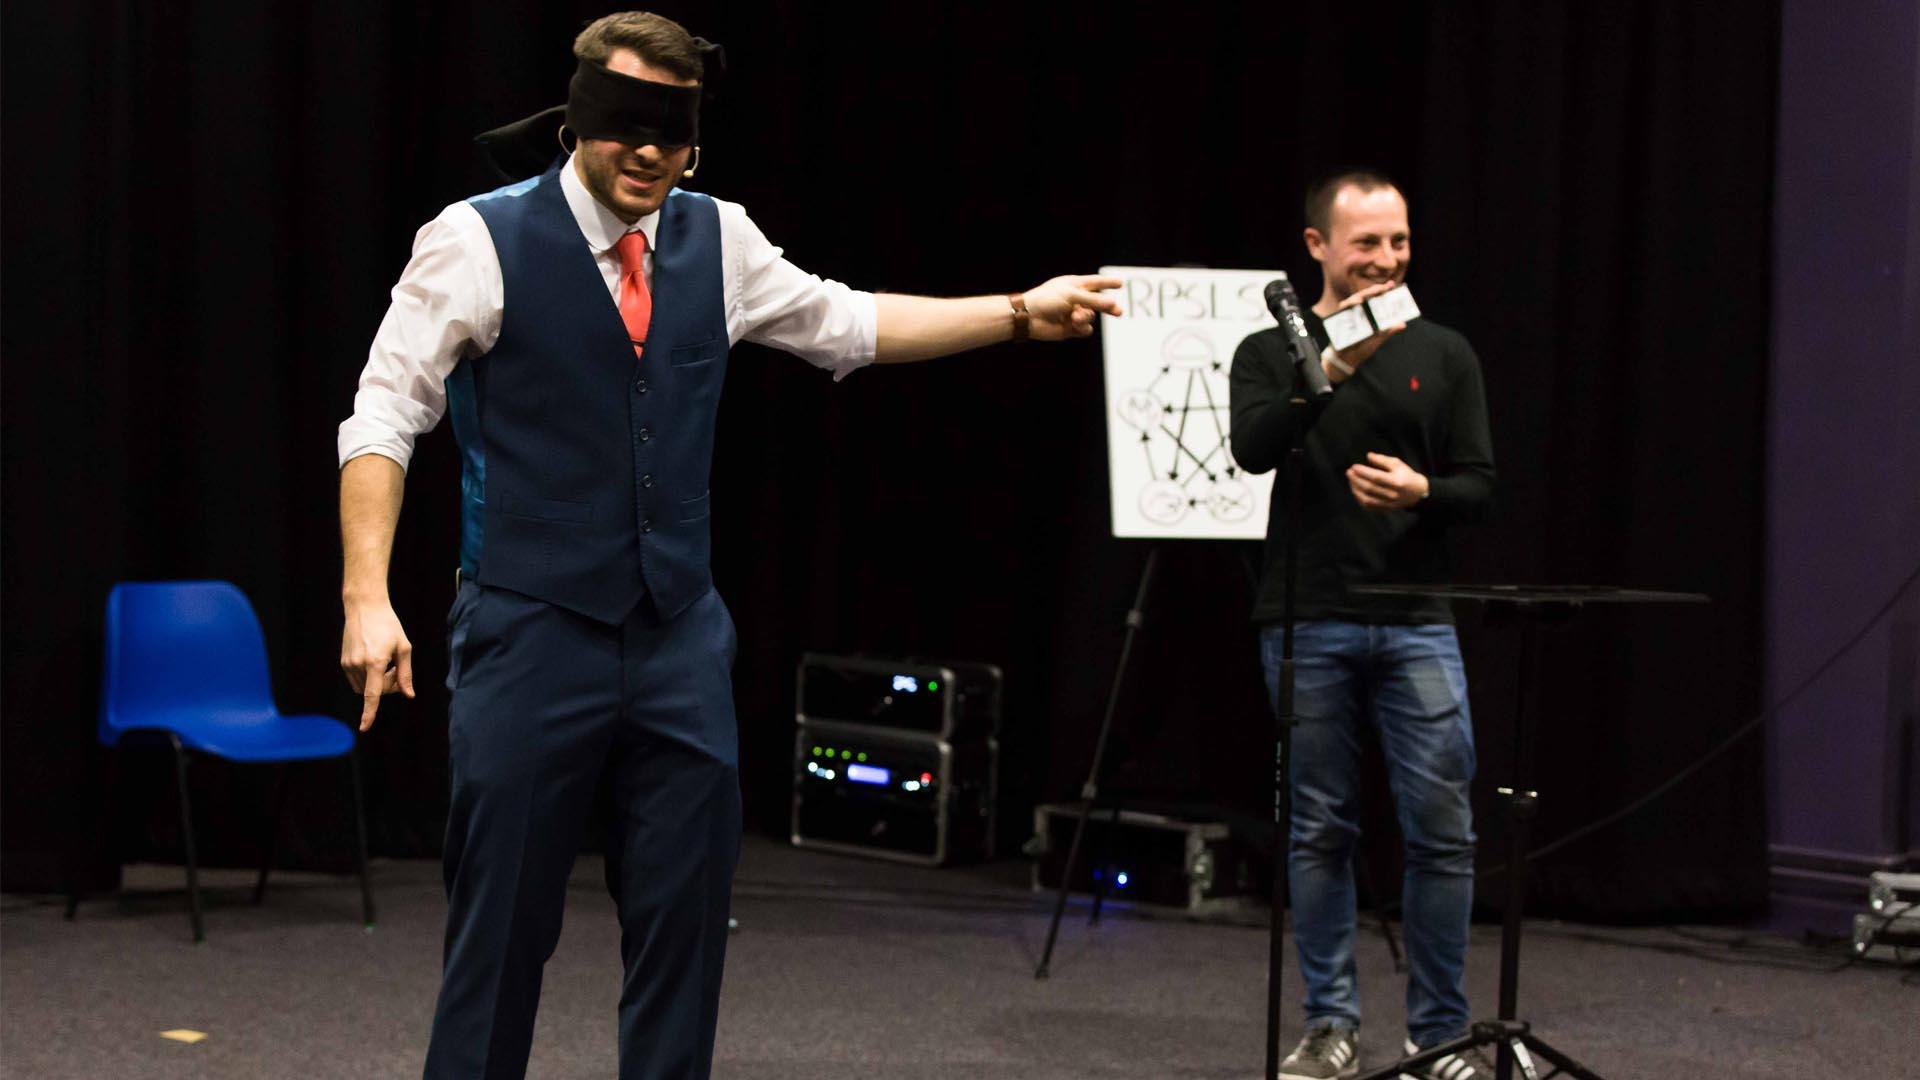 magic happens whilst blindfolded at the edinburgh fringe mind games